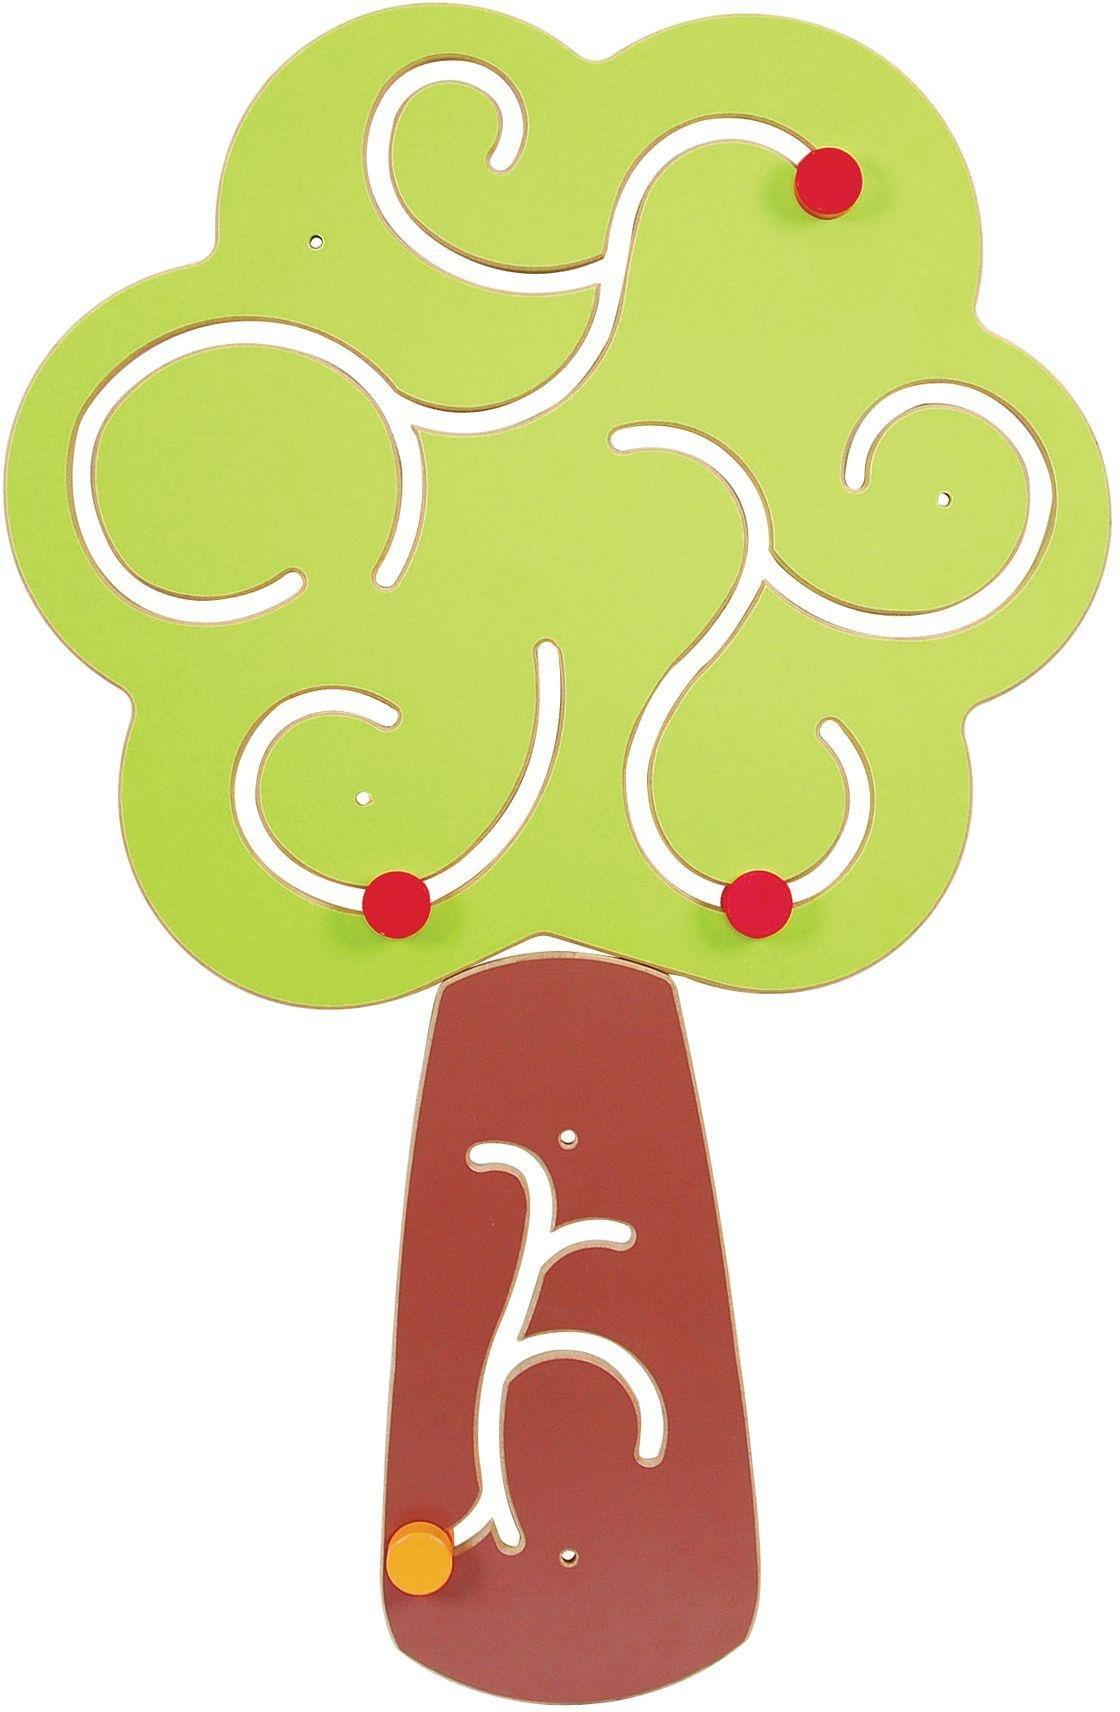 Image of Tree Play Sensory Panel.